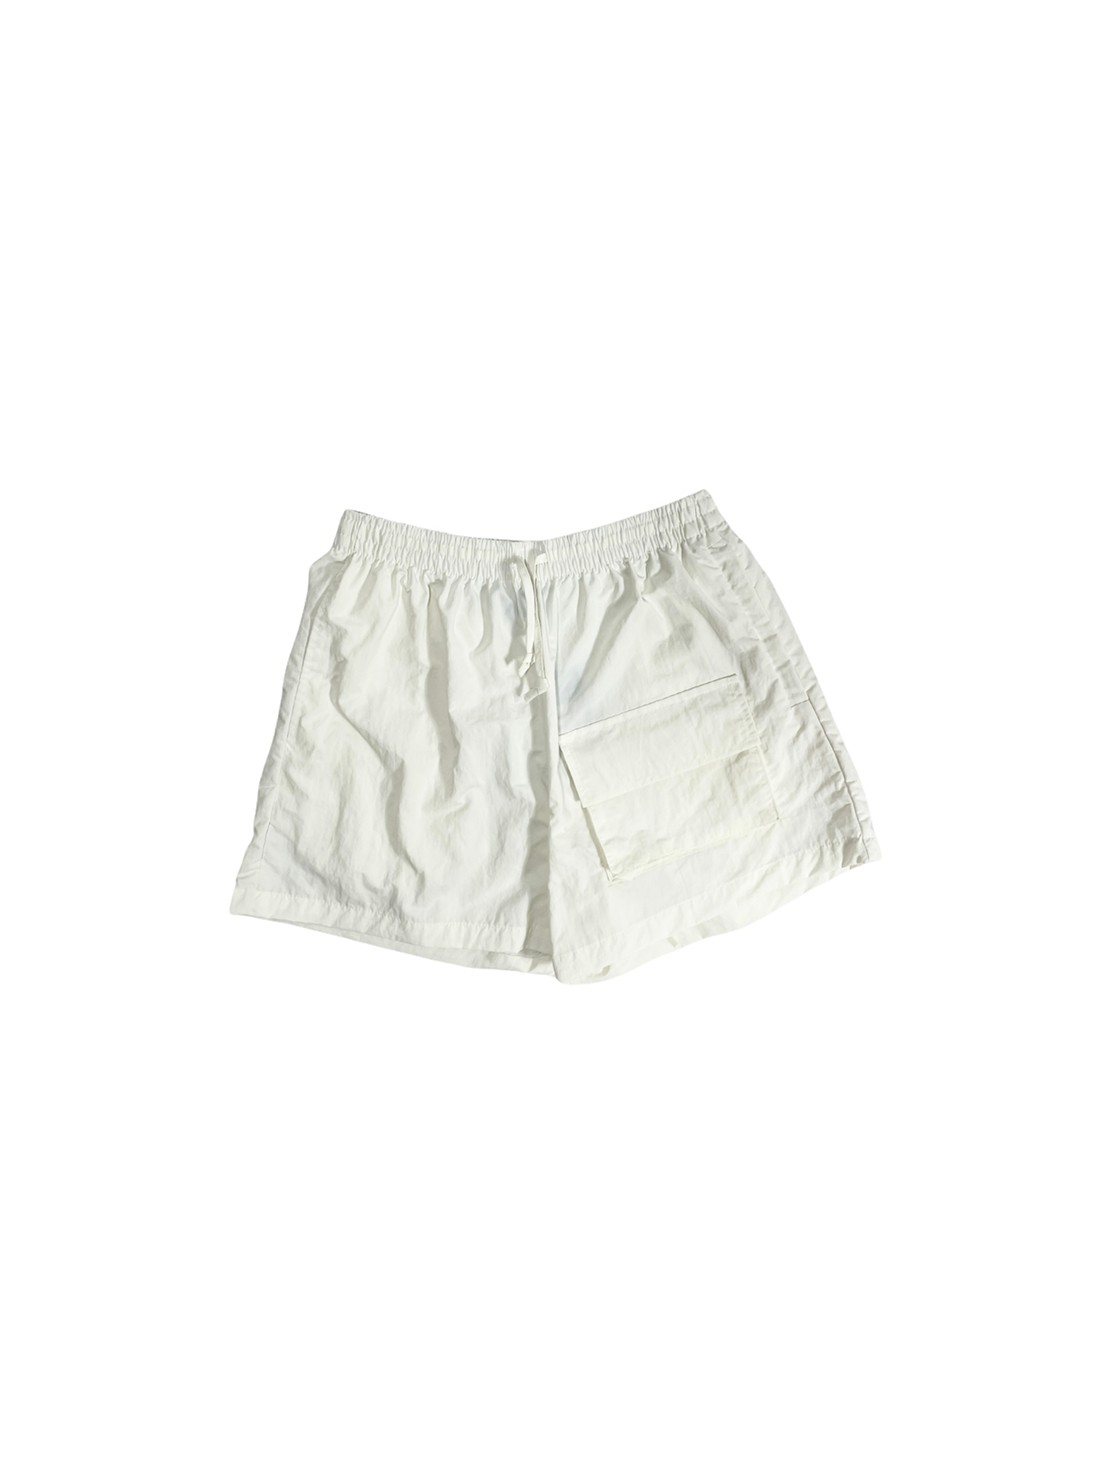 Nylon Outdoor Shorts (Off white)